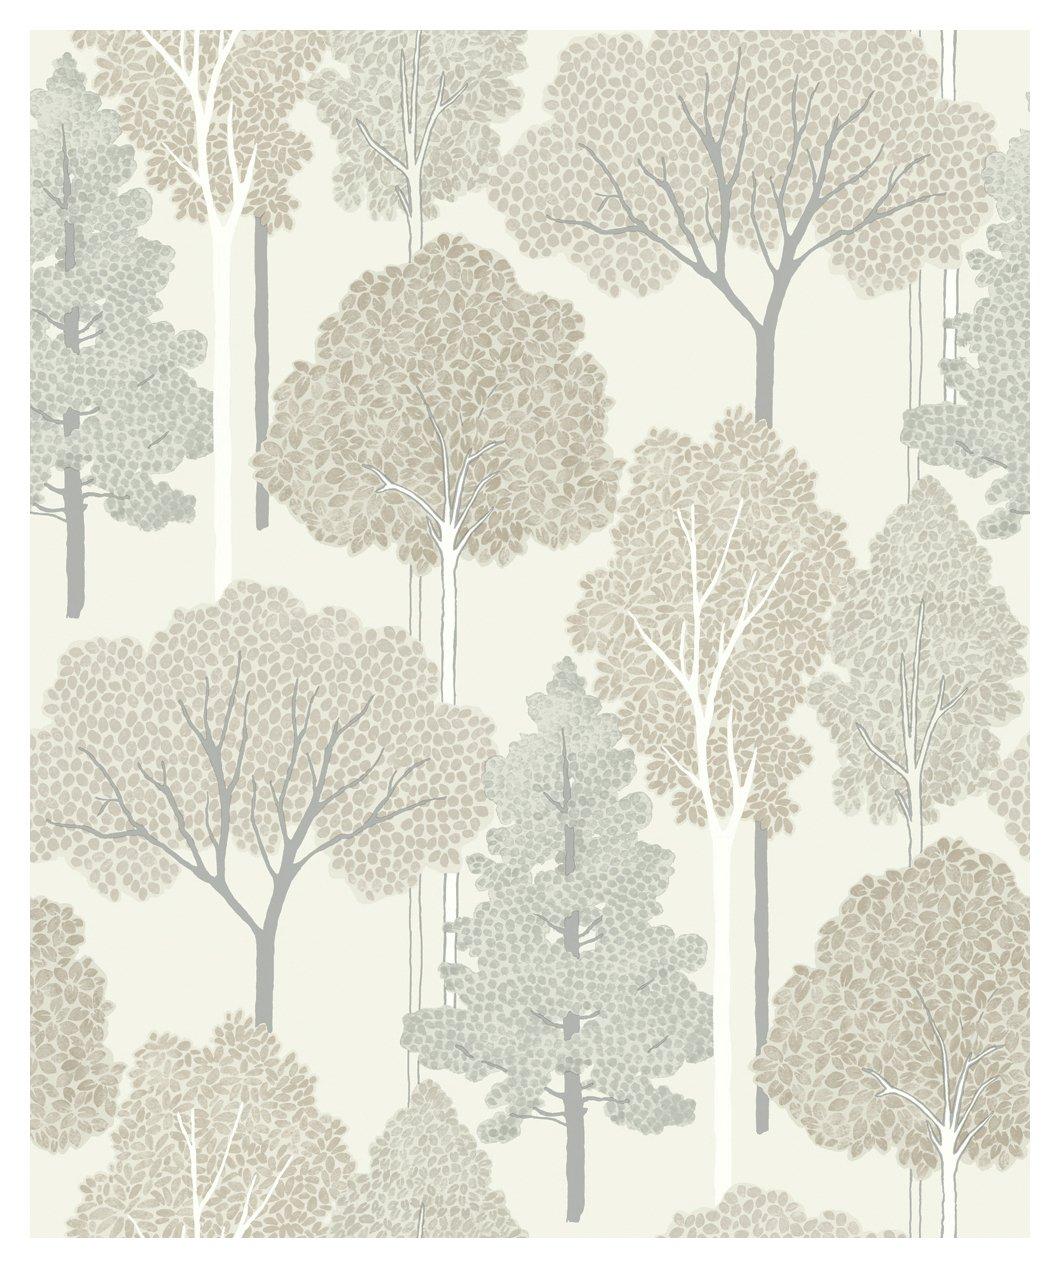 Image of Arthouse Imagine Ellwood Neutral Wallpaper.